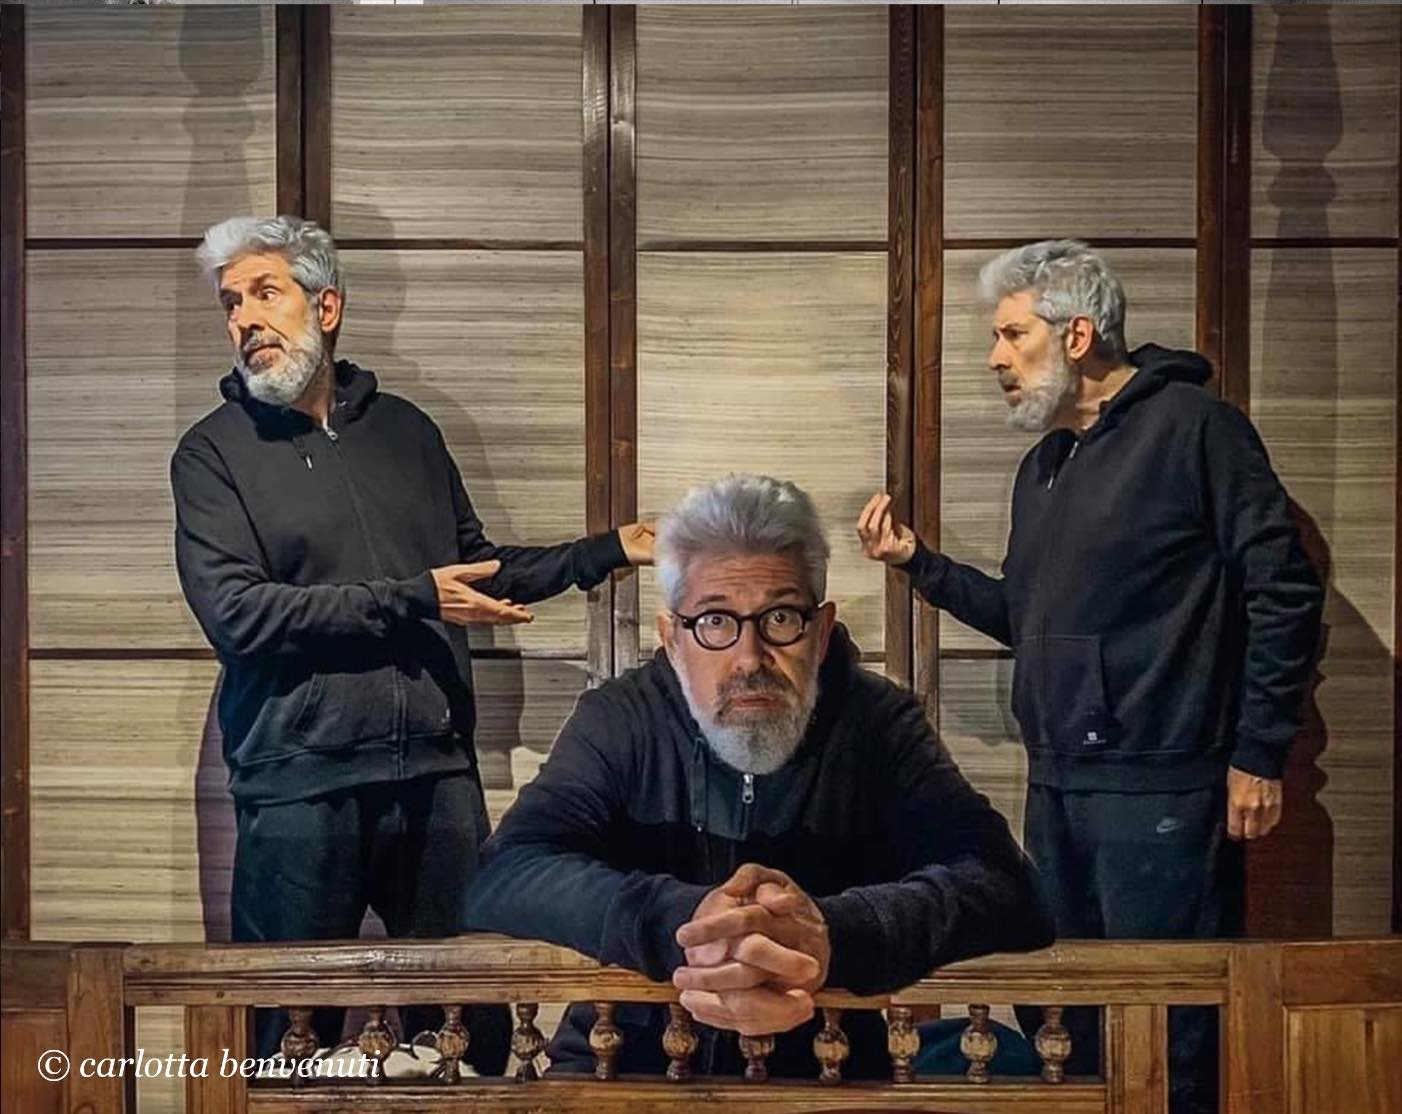 uomo-barba-occhiali